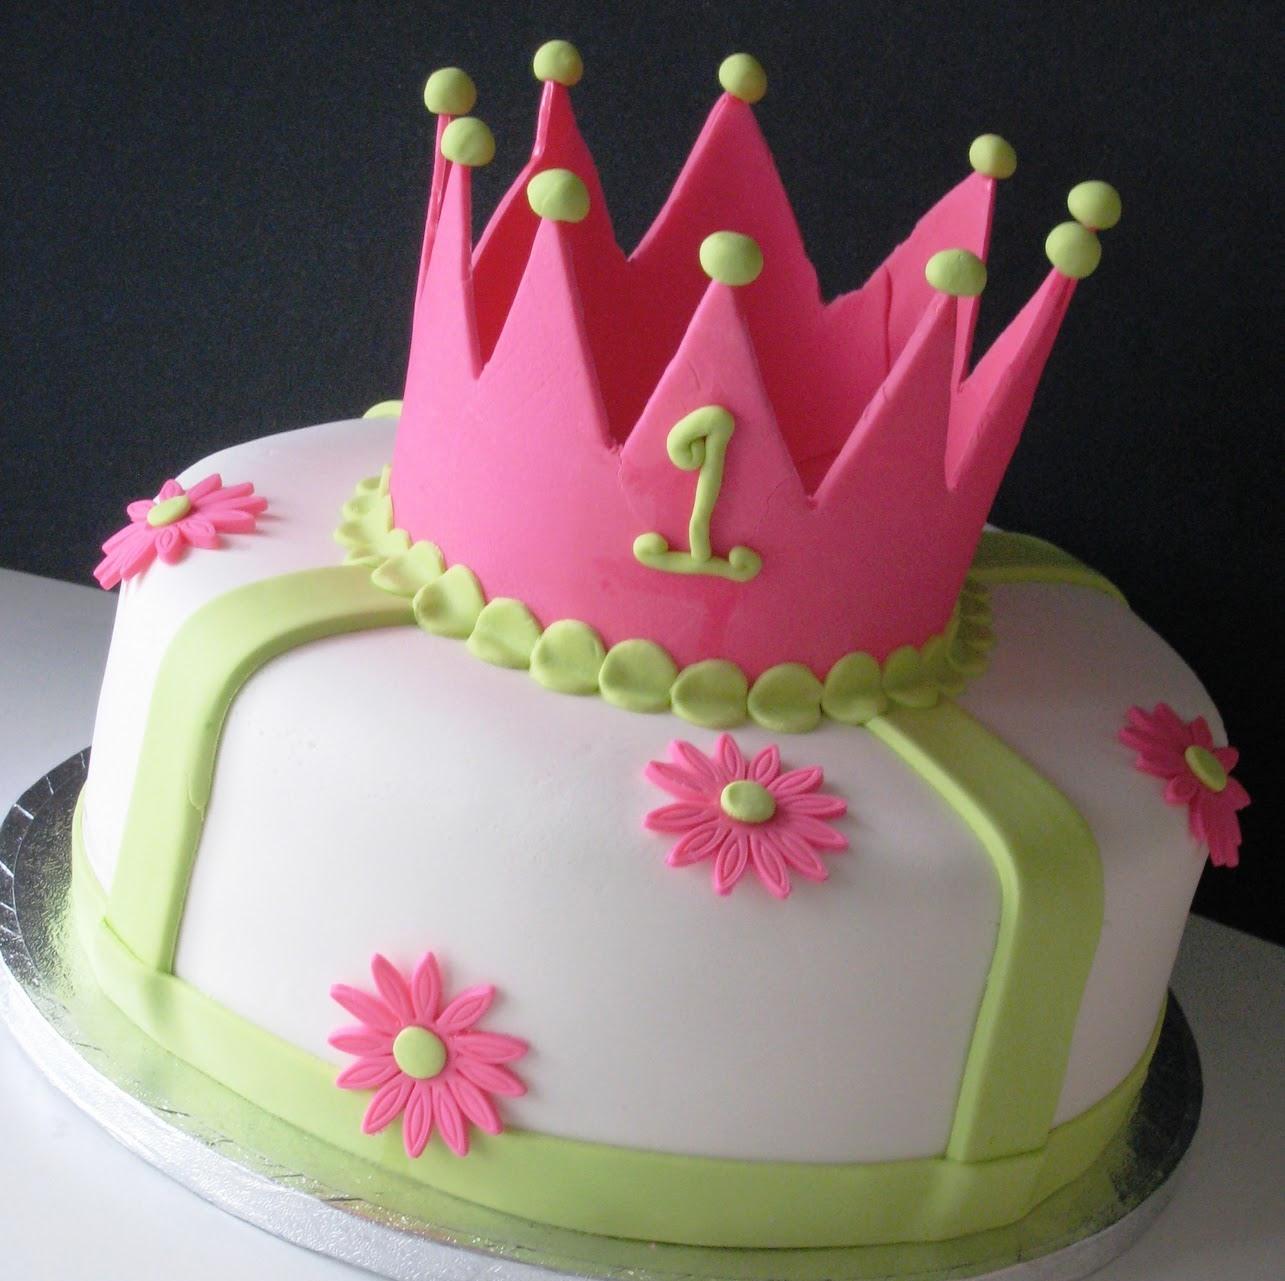 Girl cakes (3)